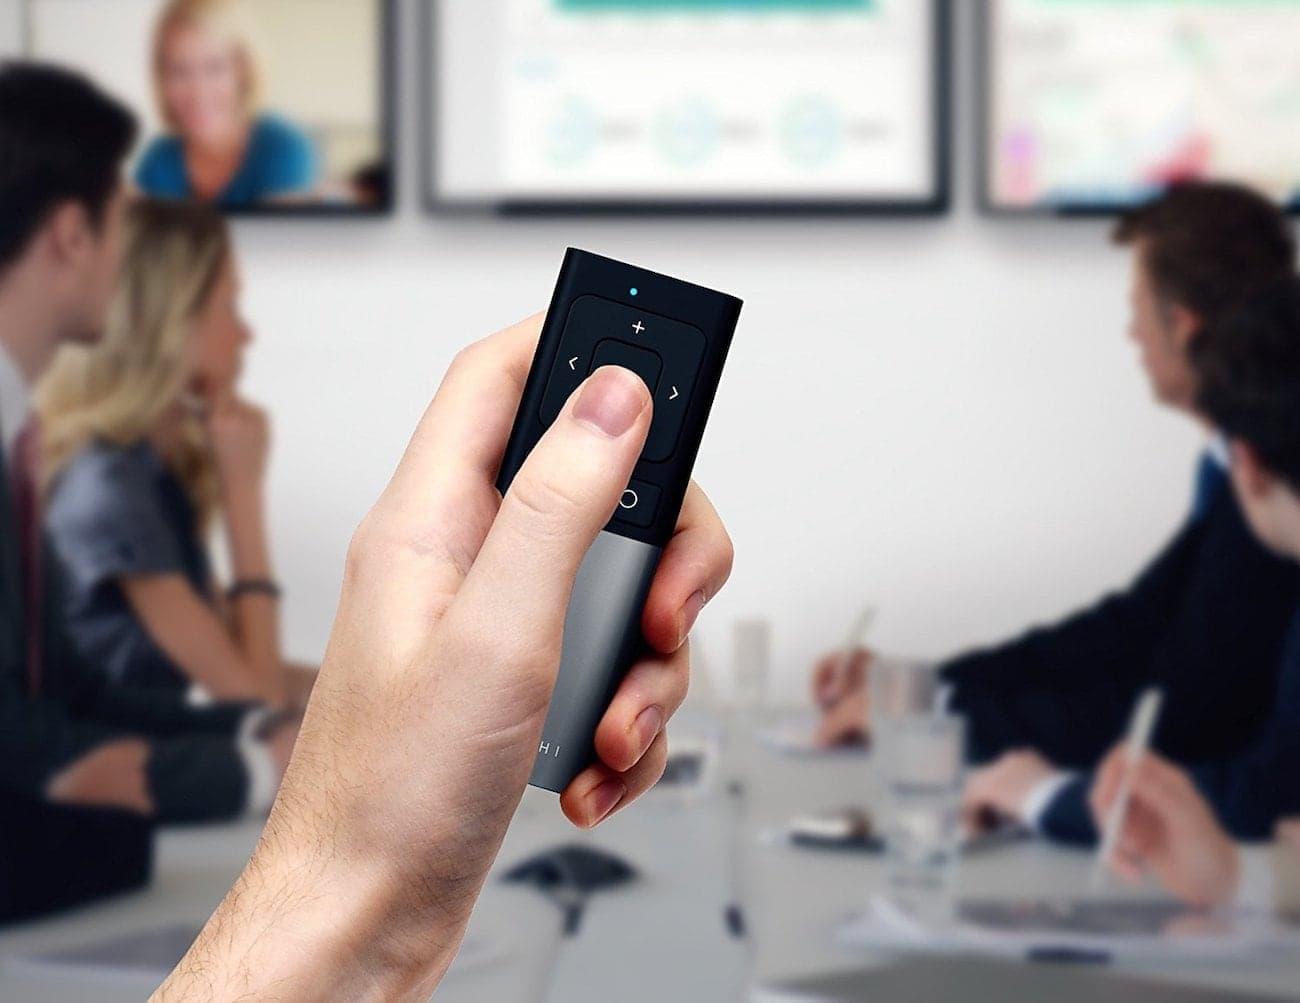 Satechi Aluminum Wireless Multimedia Remote Control